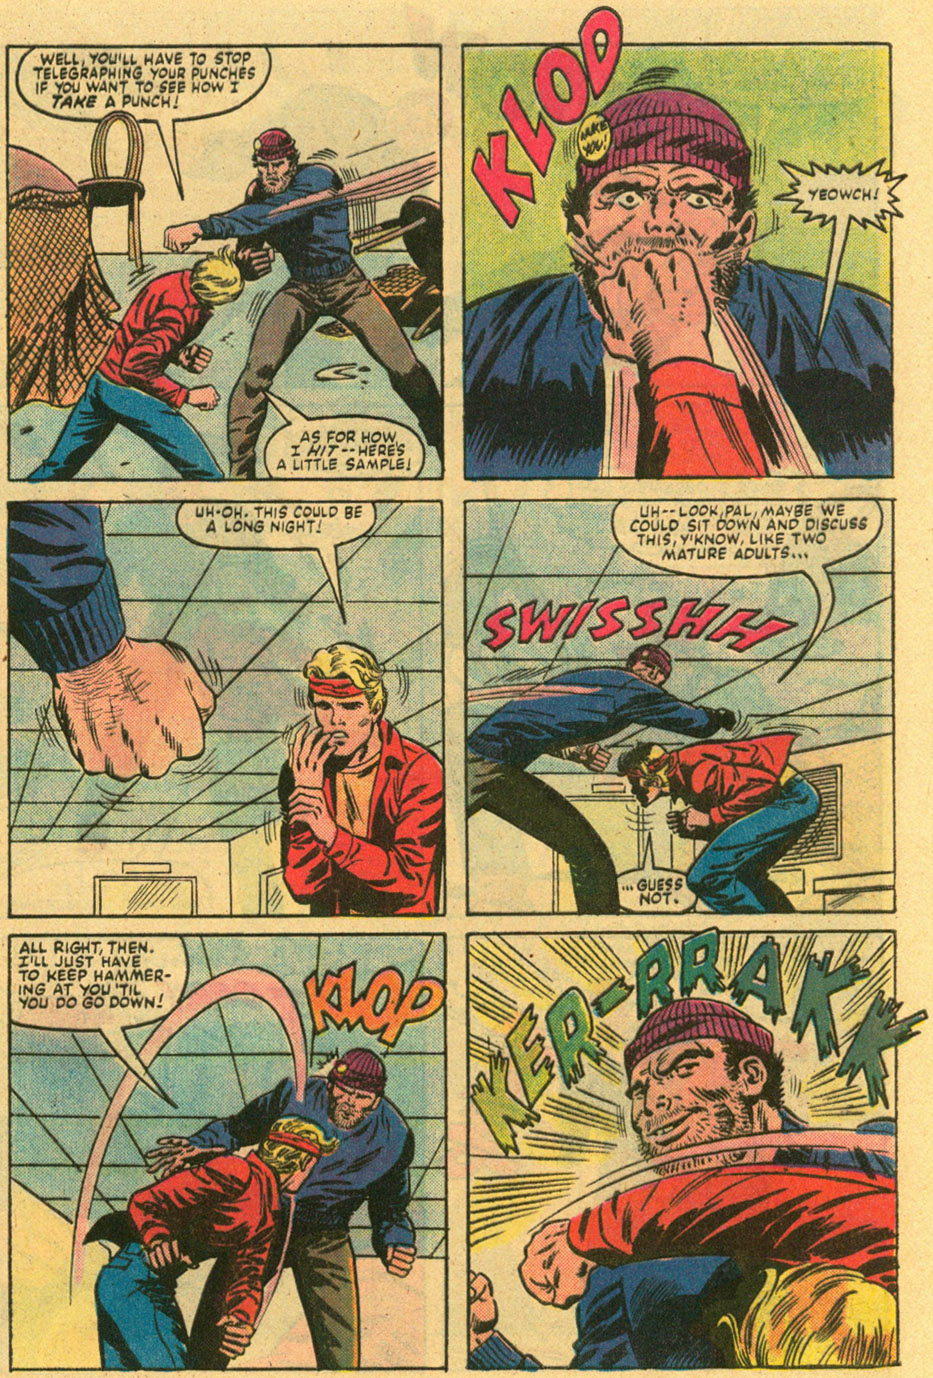 Read online U.S. 1 comic -  Issue #2 - 5